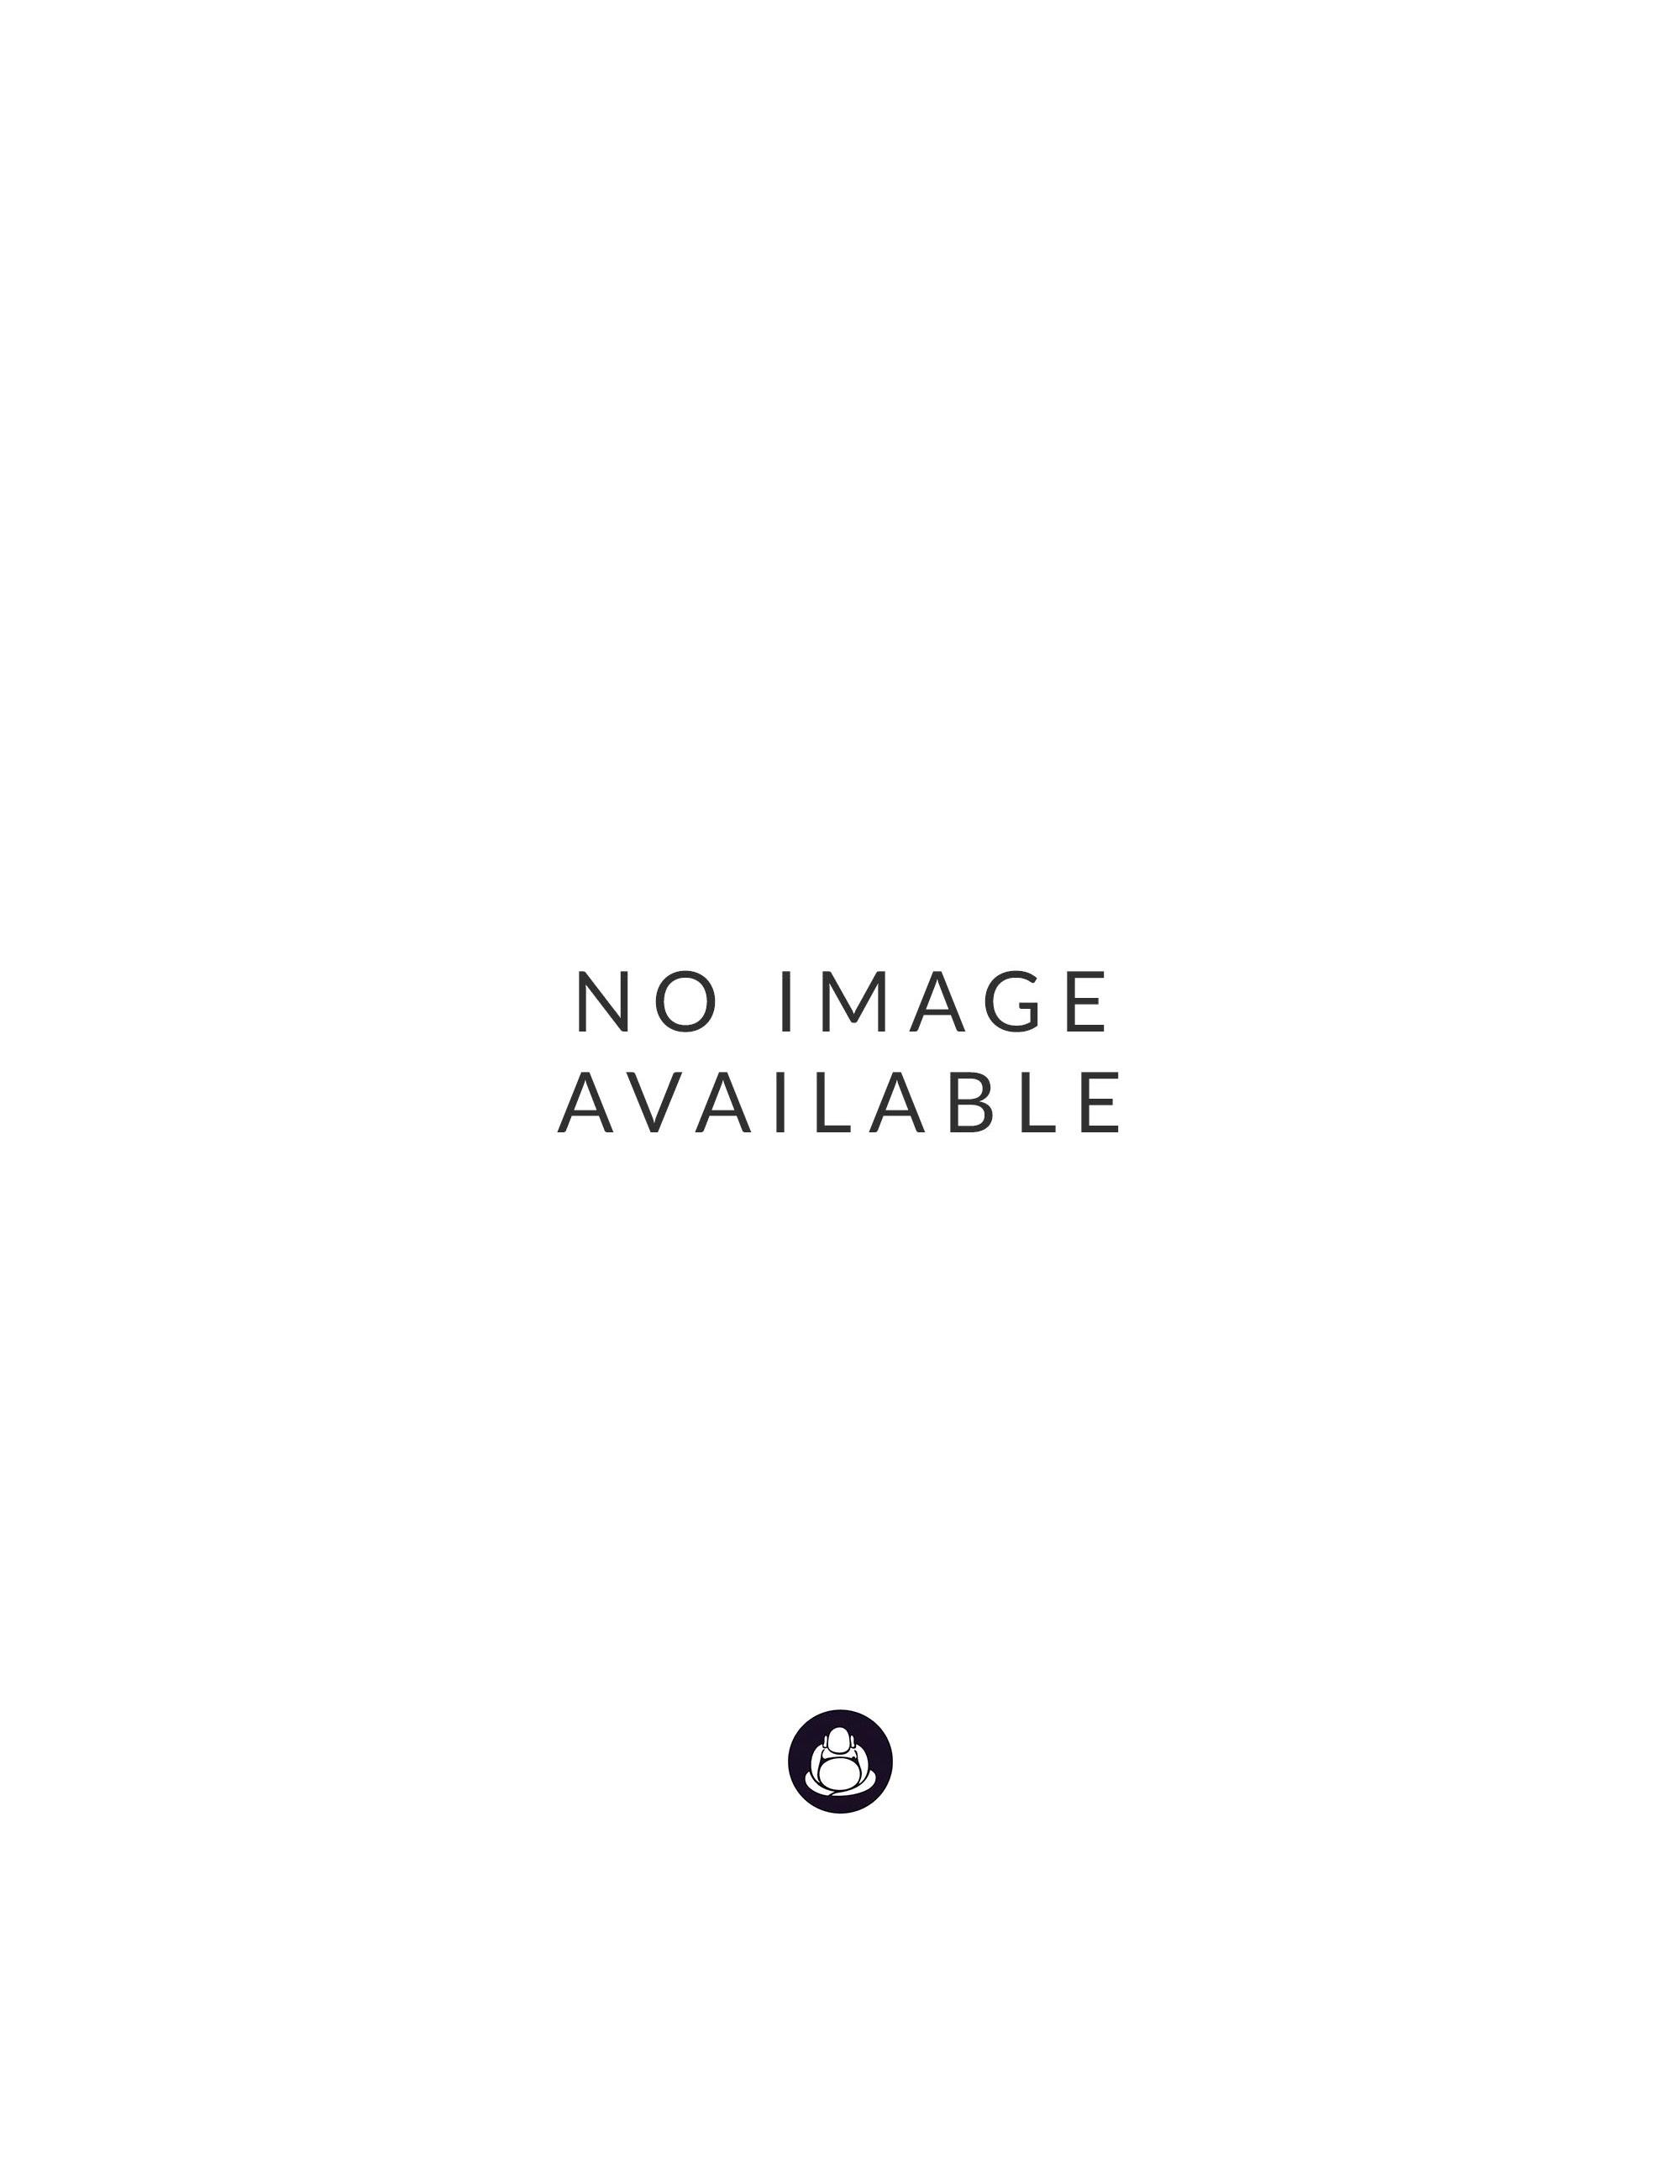 75c0b1930ffc Brixton L/S Bowery Flannel Shirt - Heather Grey/Charcoal - Clothing ...